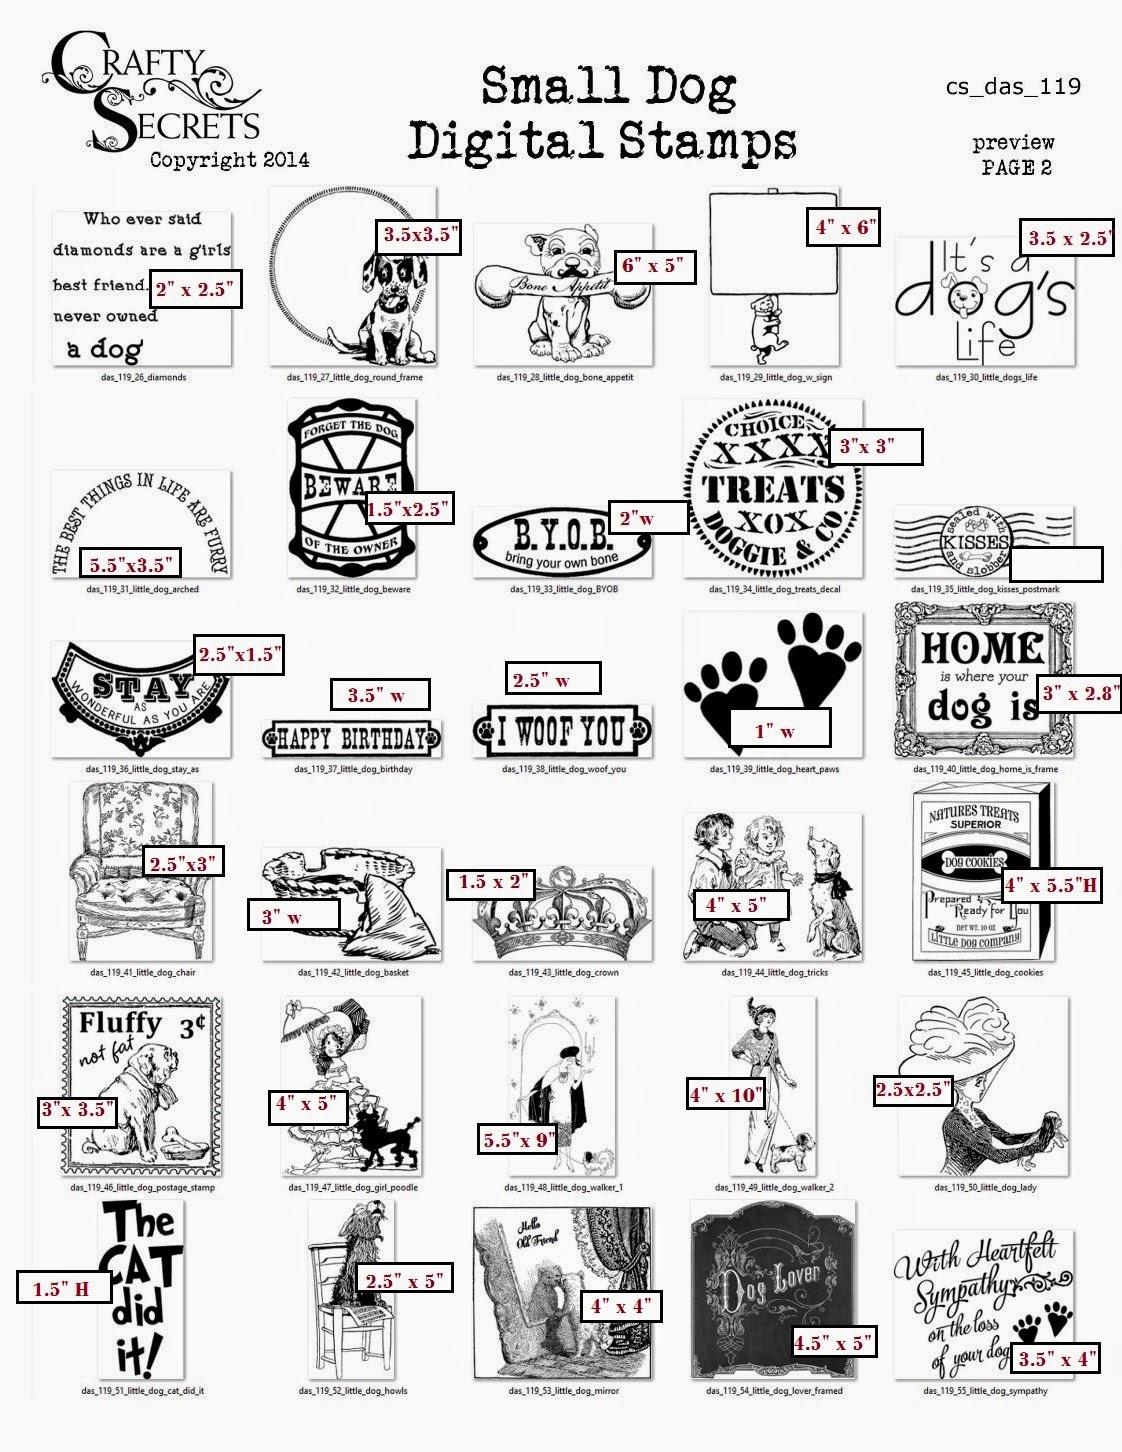 Crafty Secrets Heartwarming Vintage Ideas And Tips